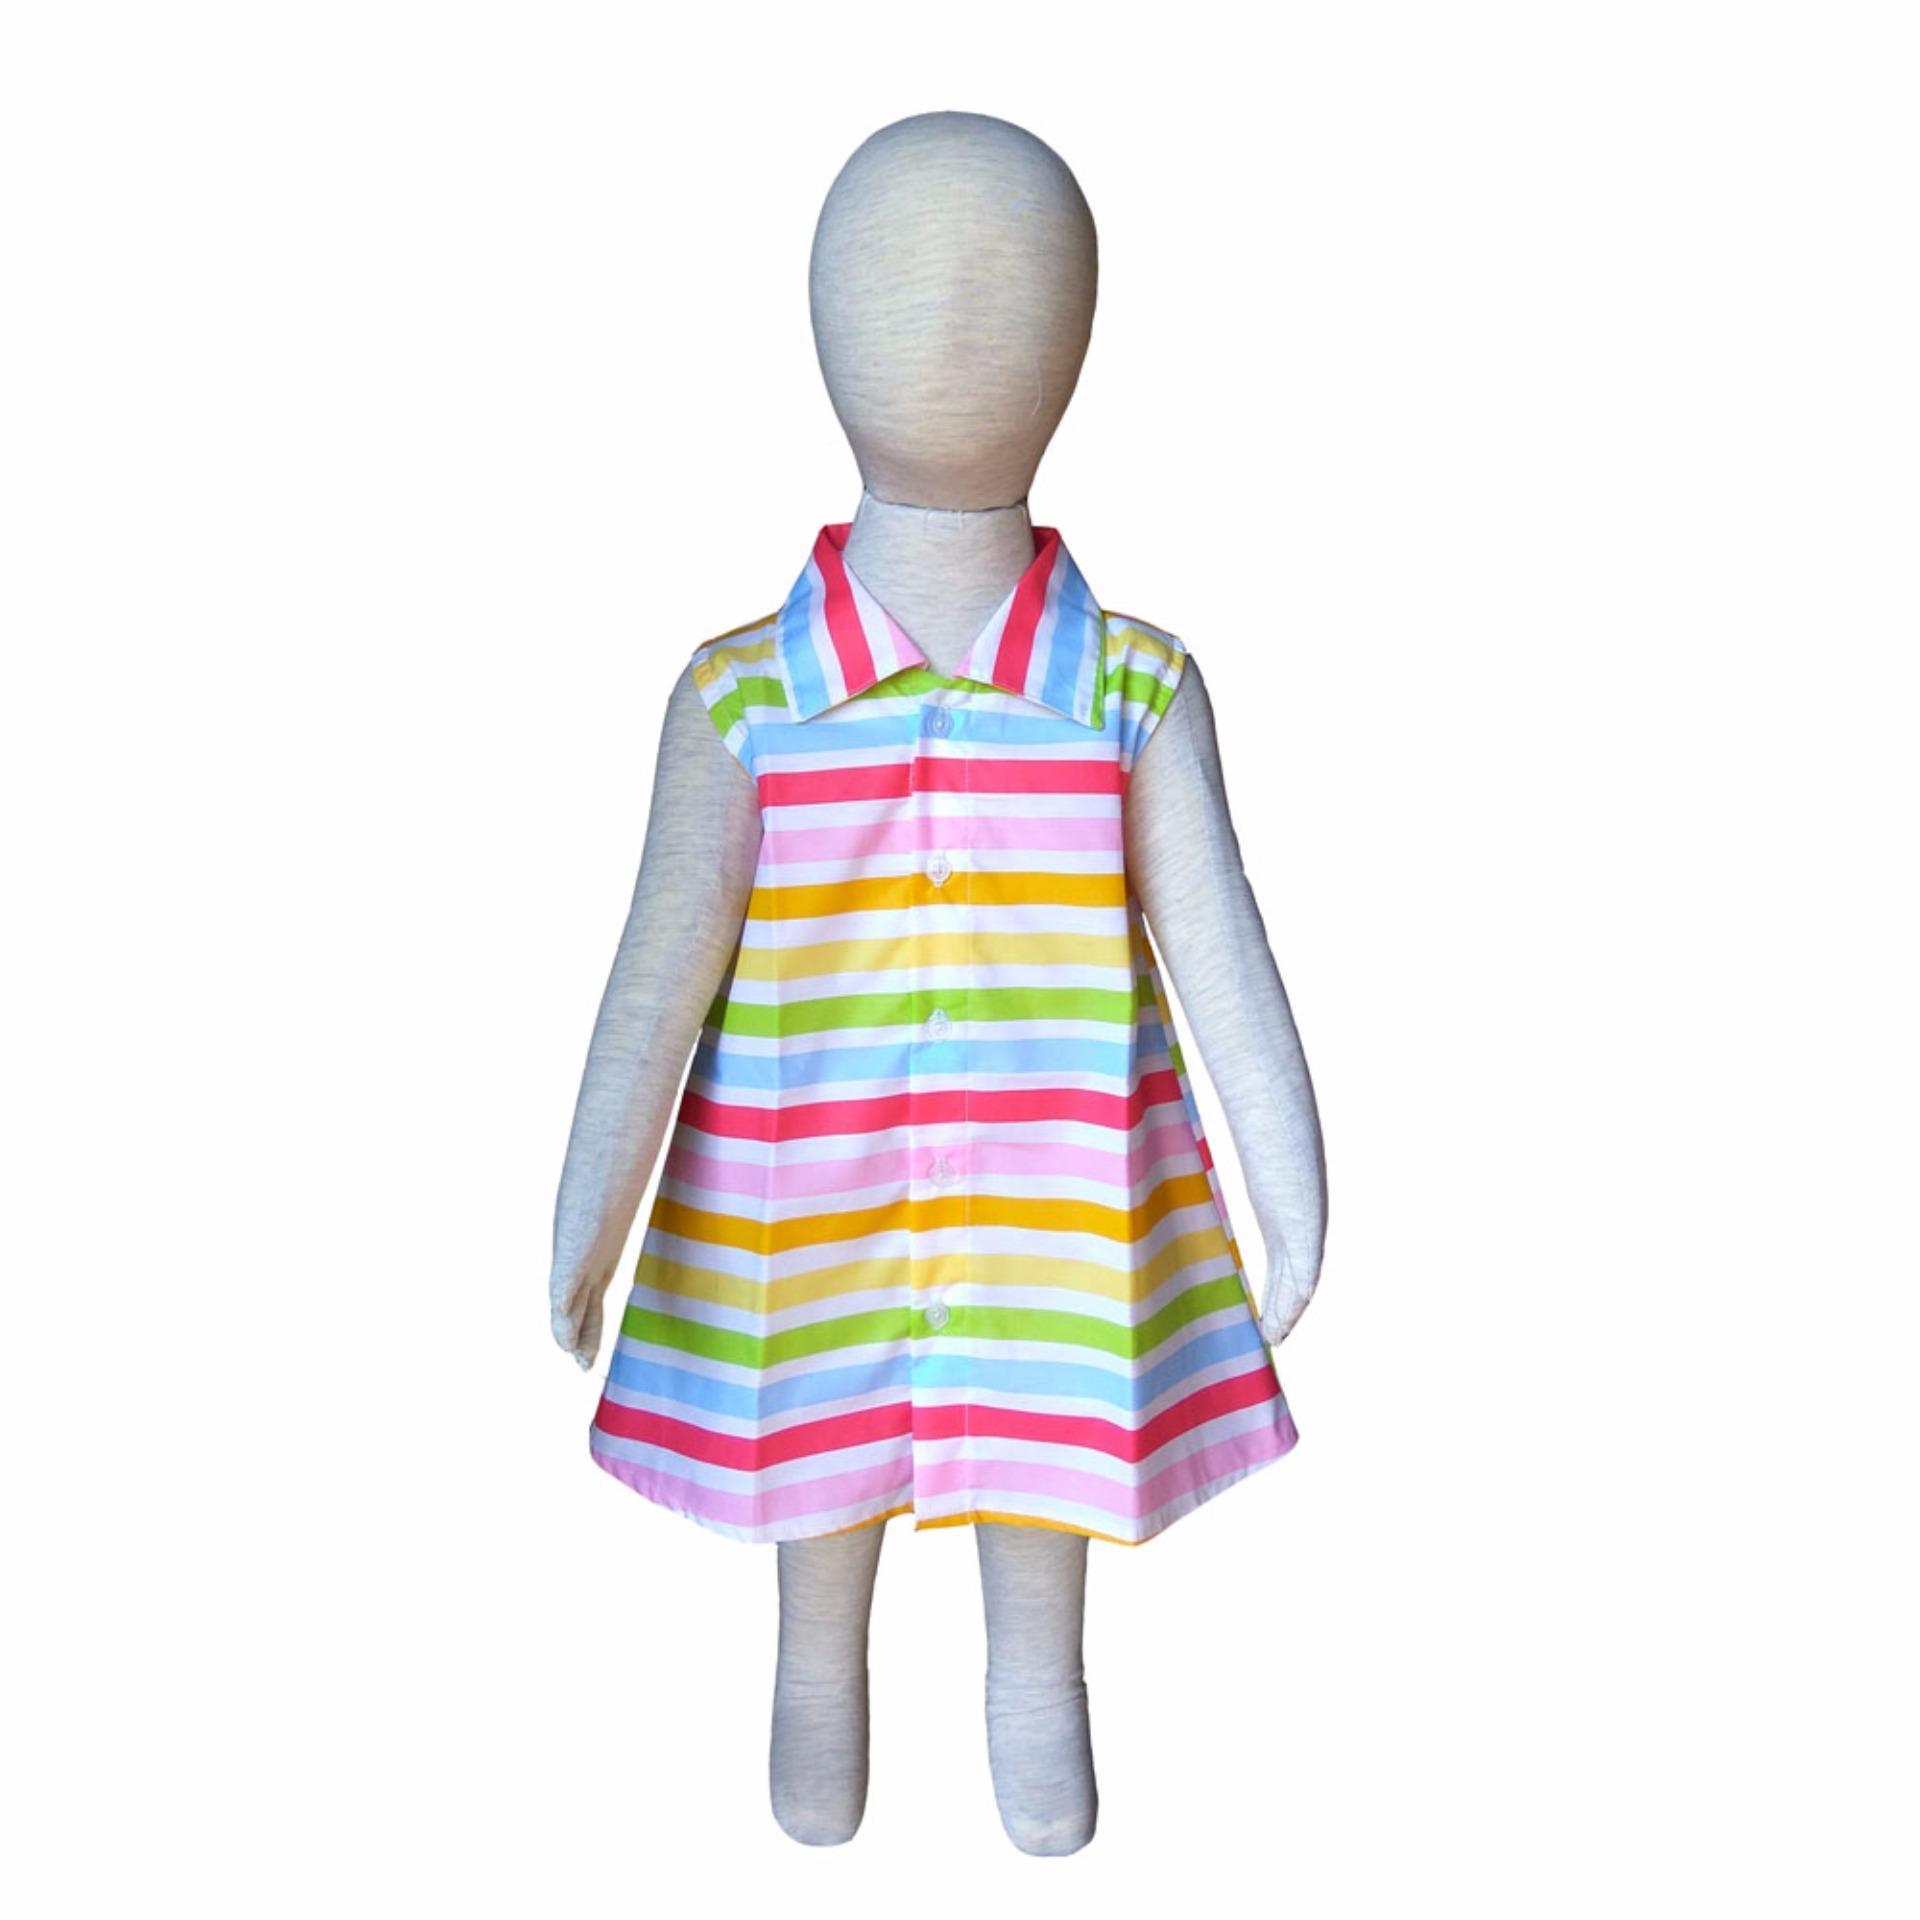 Grow Baju Gaun Harian Anak Pinguin ( Grow Gown Dress Clothes Pinguin Child ) Tuttyfrutyline